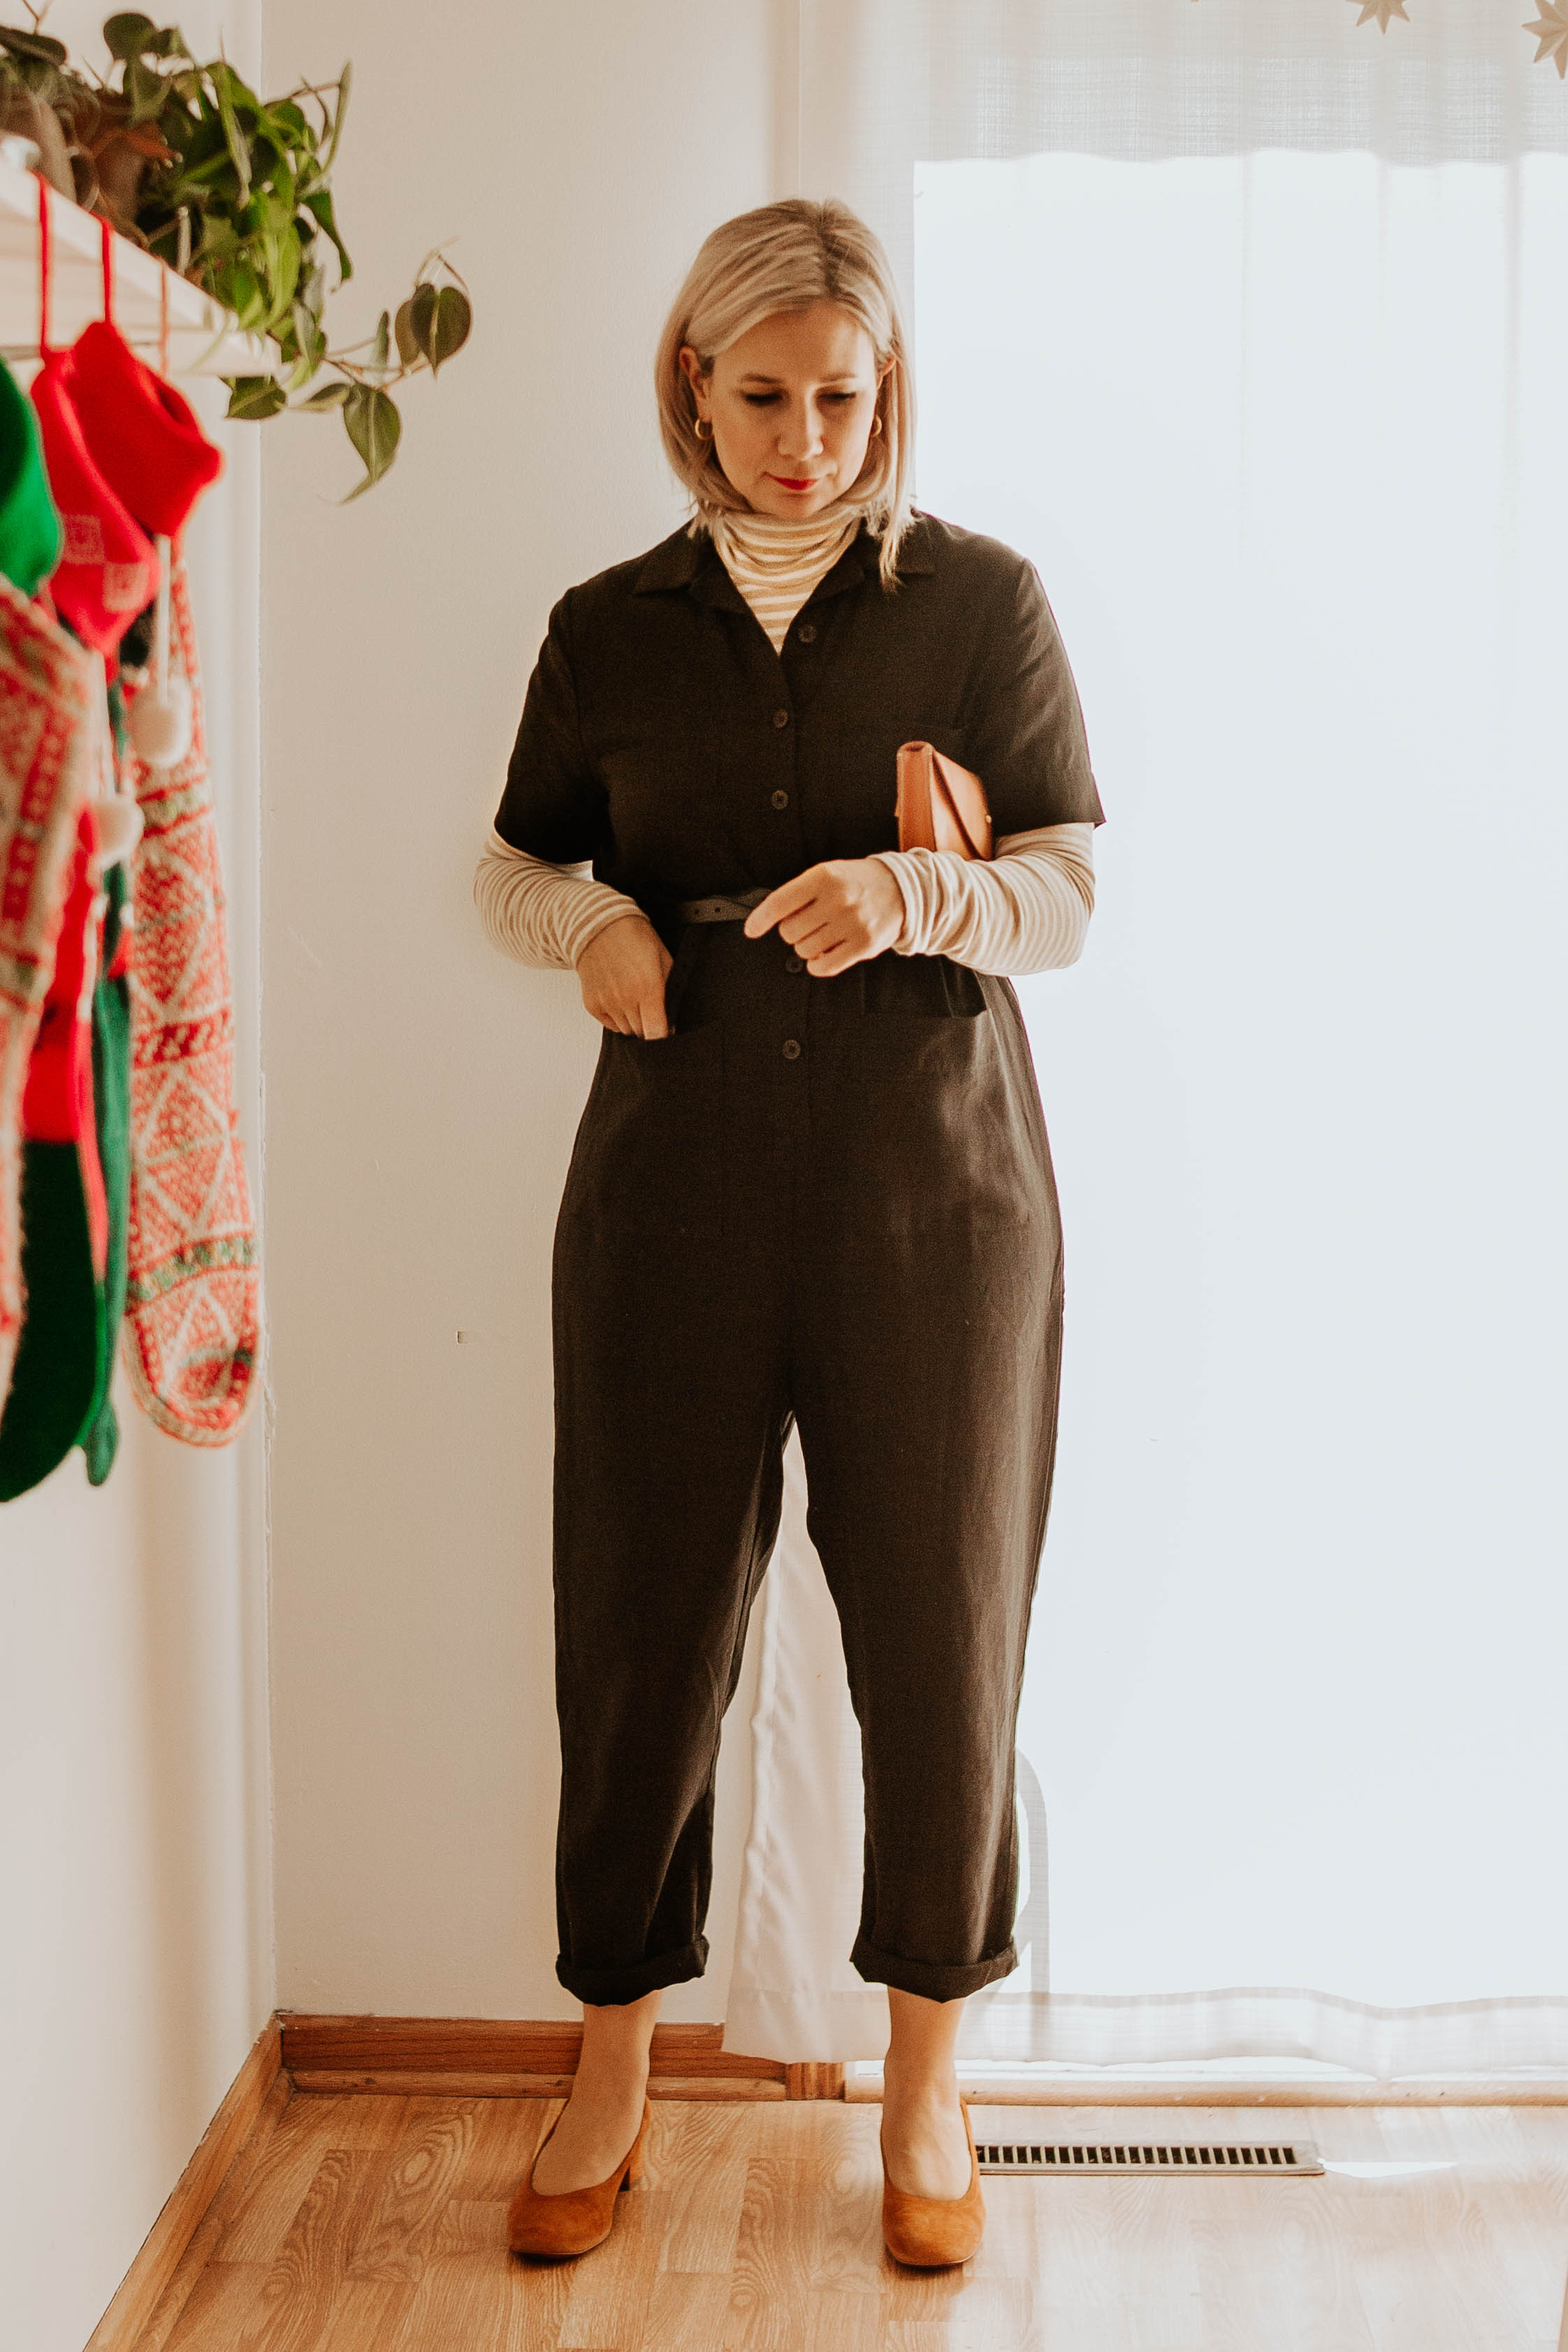 Mini Holiday Lookbook Featuring Ethical Fashion, tradlands jumpsuit, black short sleeve jumpsuit, everlane day heels, striped turtleneck, turtleneck under jumpsuit, tree fairfax bum bag, belt bag